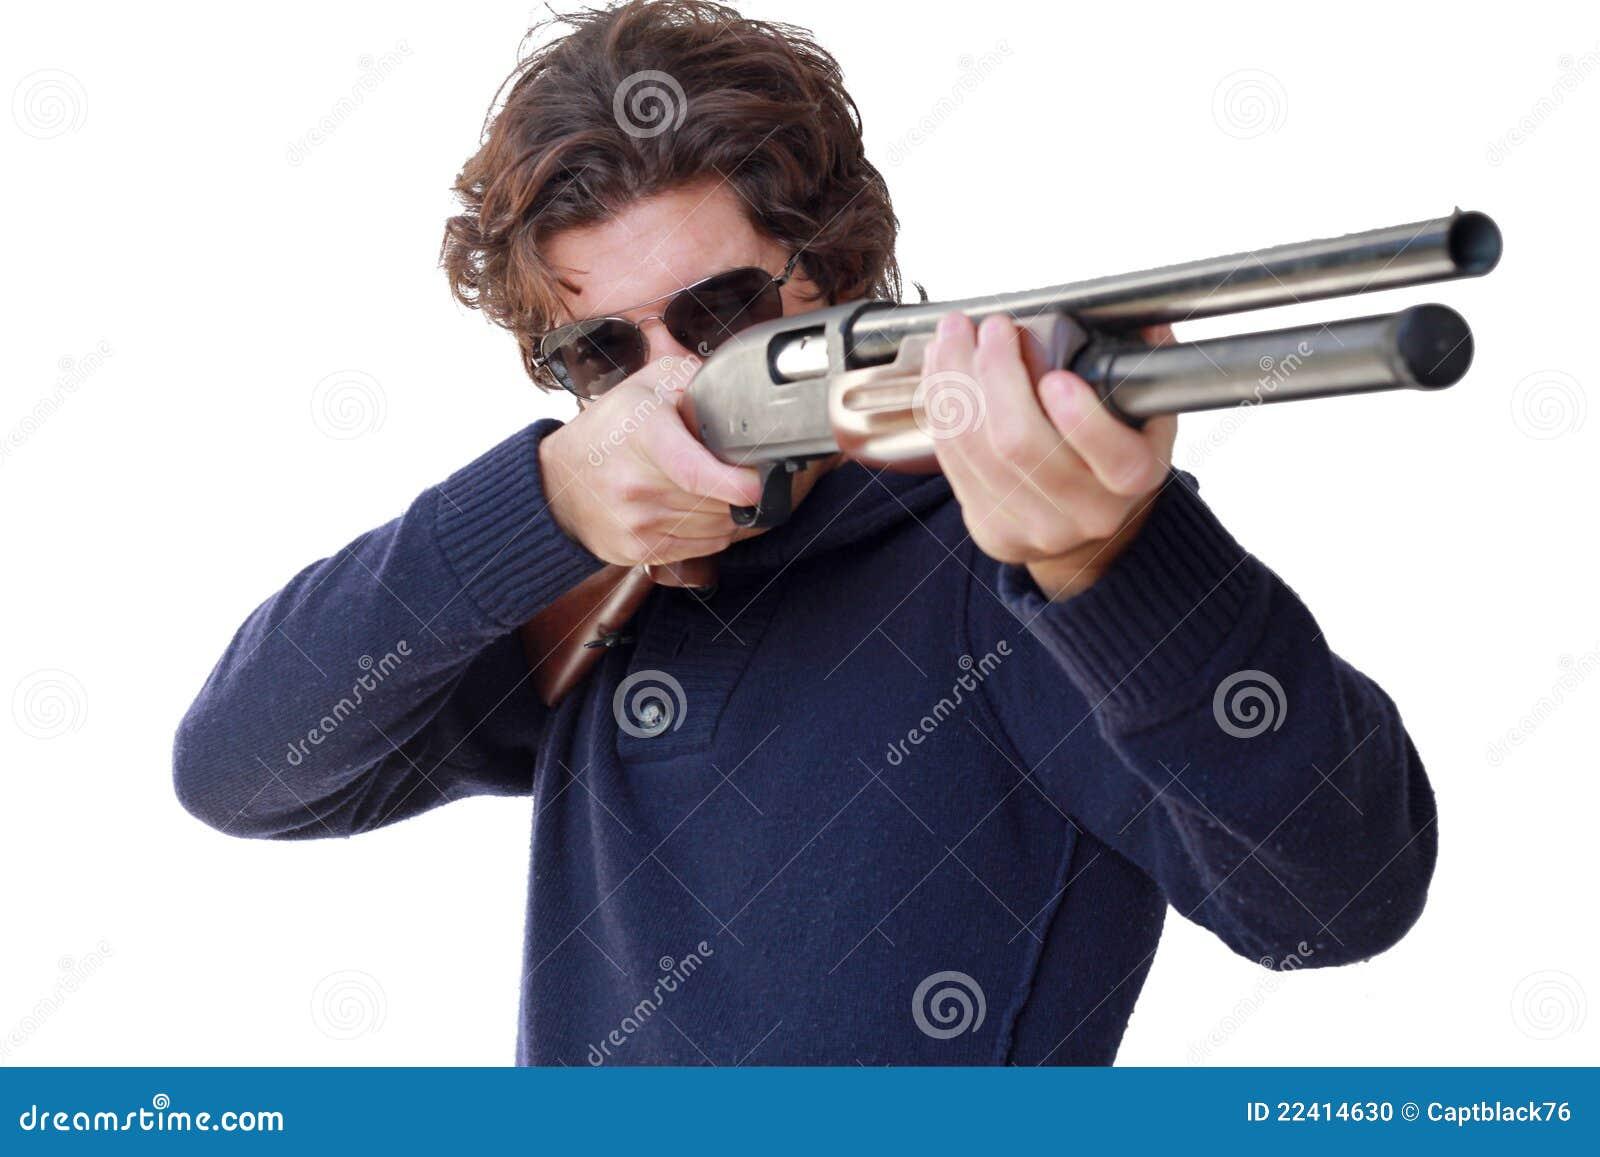 Aiming With Shotgun Isolated Stock Photo - Image: 22414630